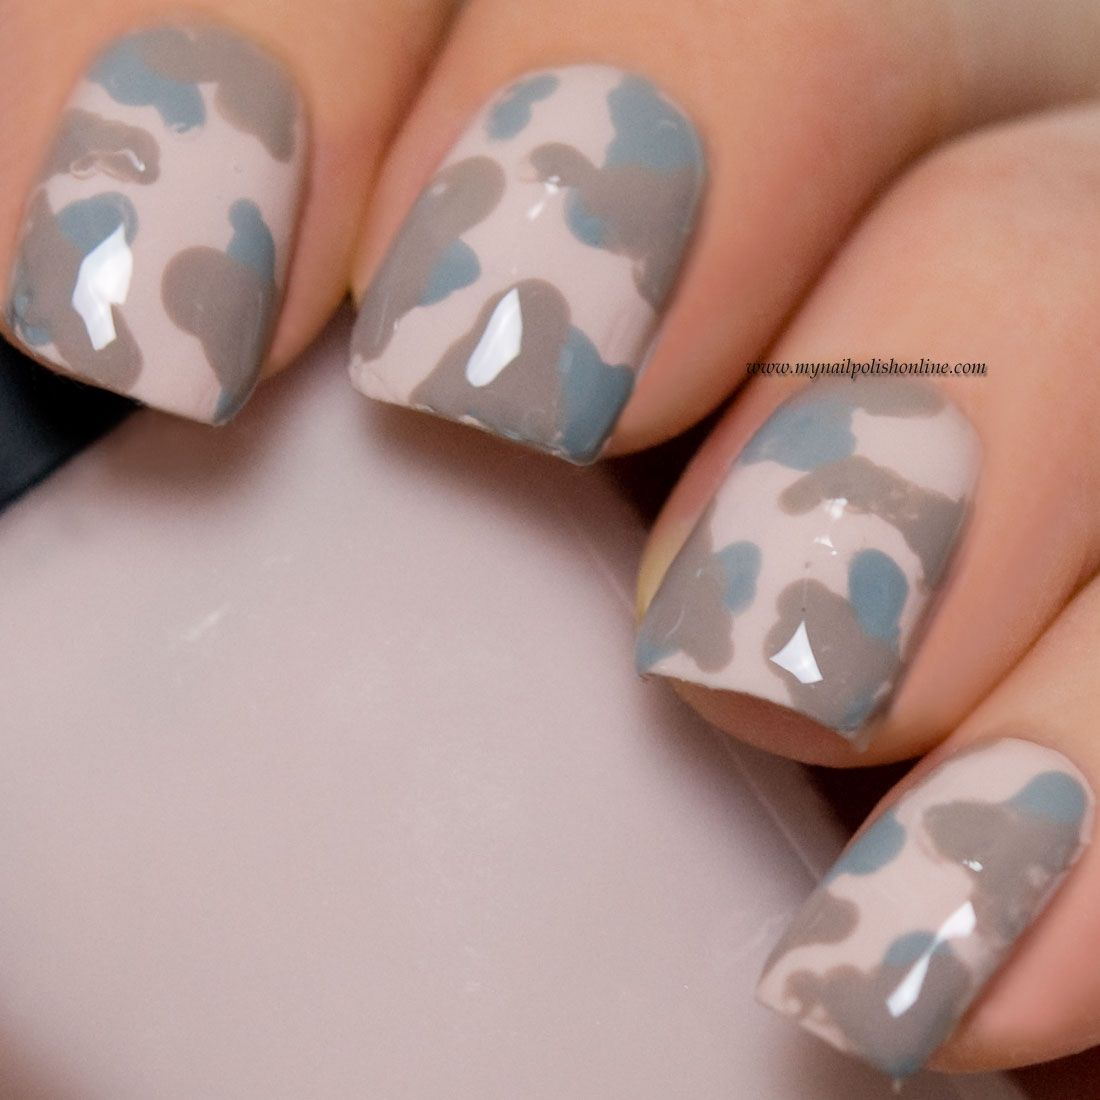 Freehanded camouflage nails | Nagelkunst, Nagelschere und Kosmetik